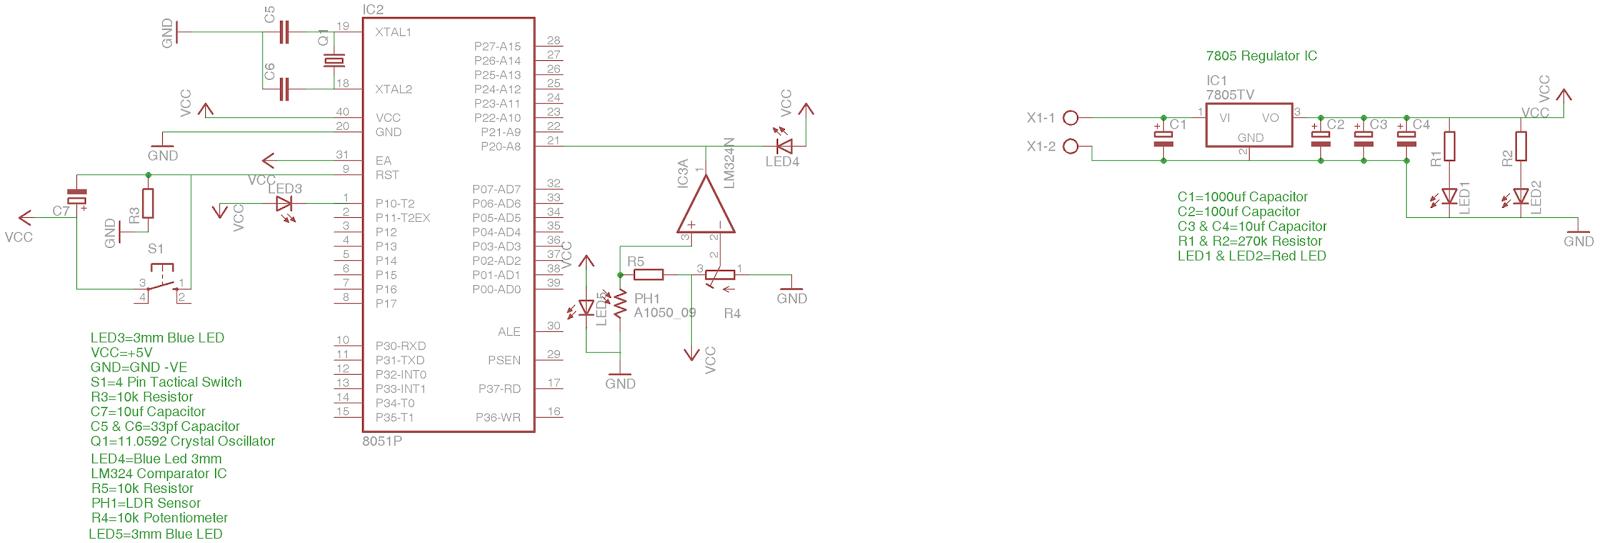 Bandpass Filter Circuit Controlcircuit Circuit Diagram Seekic